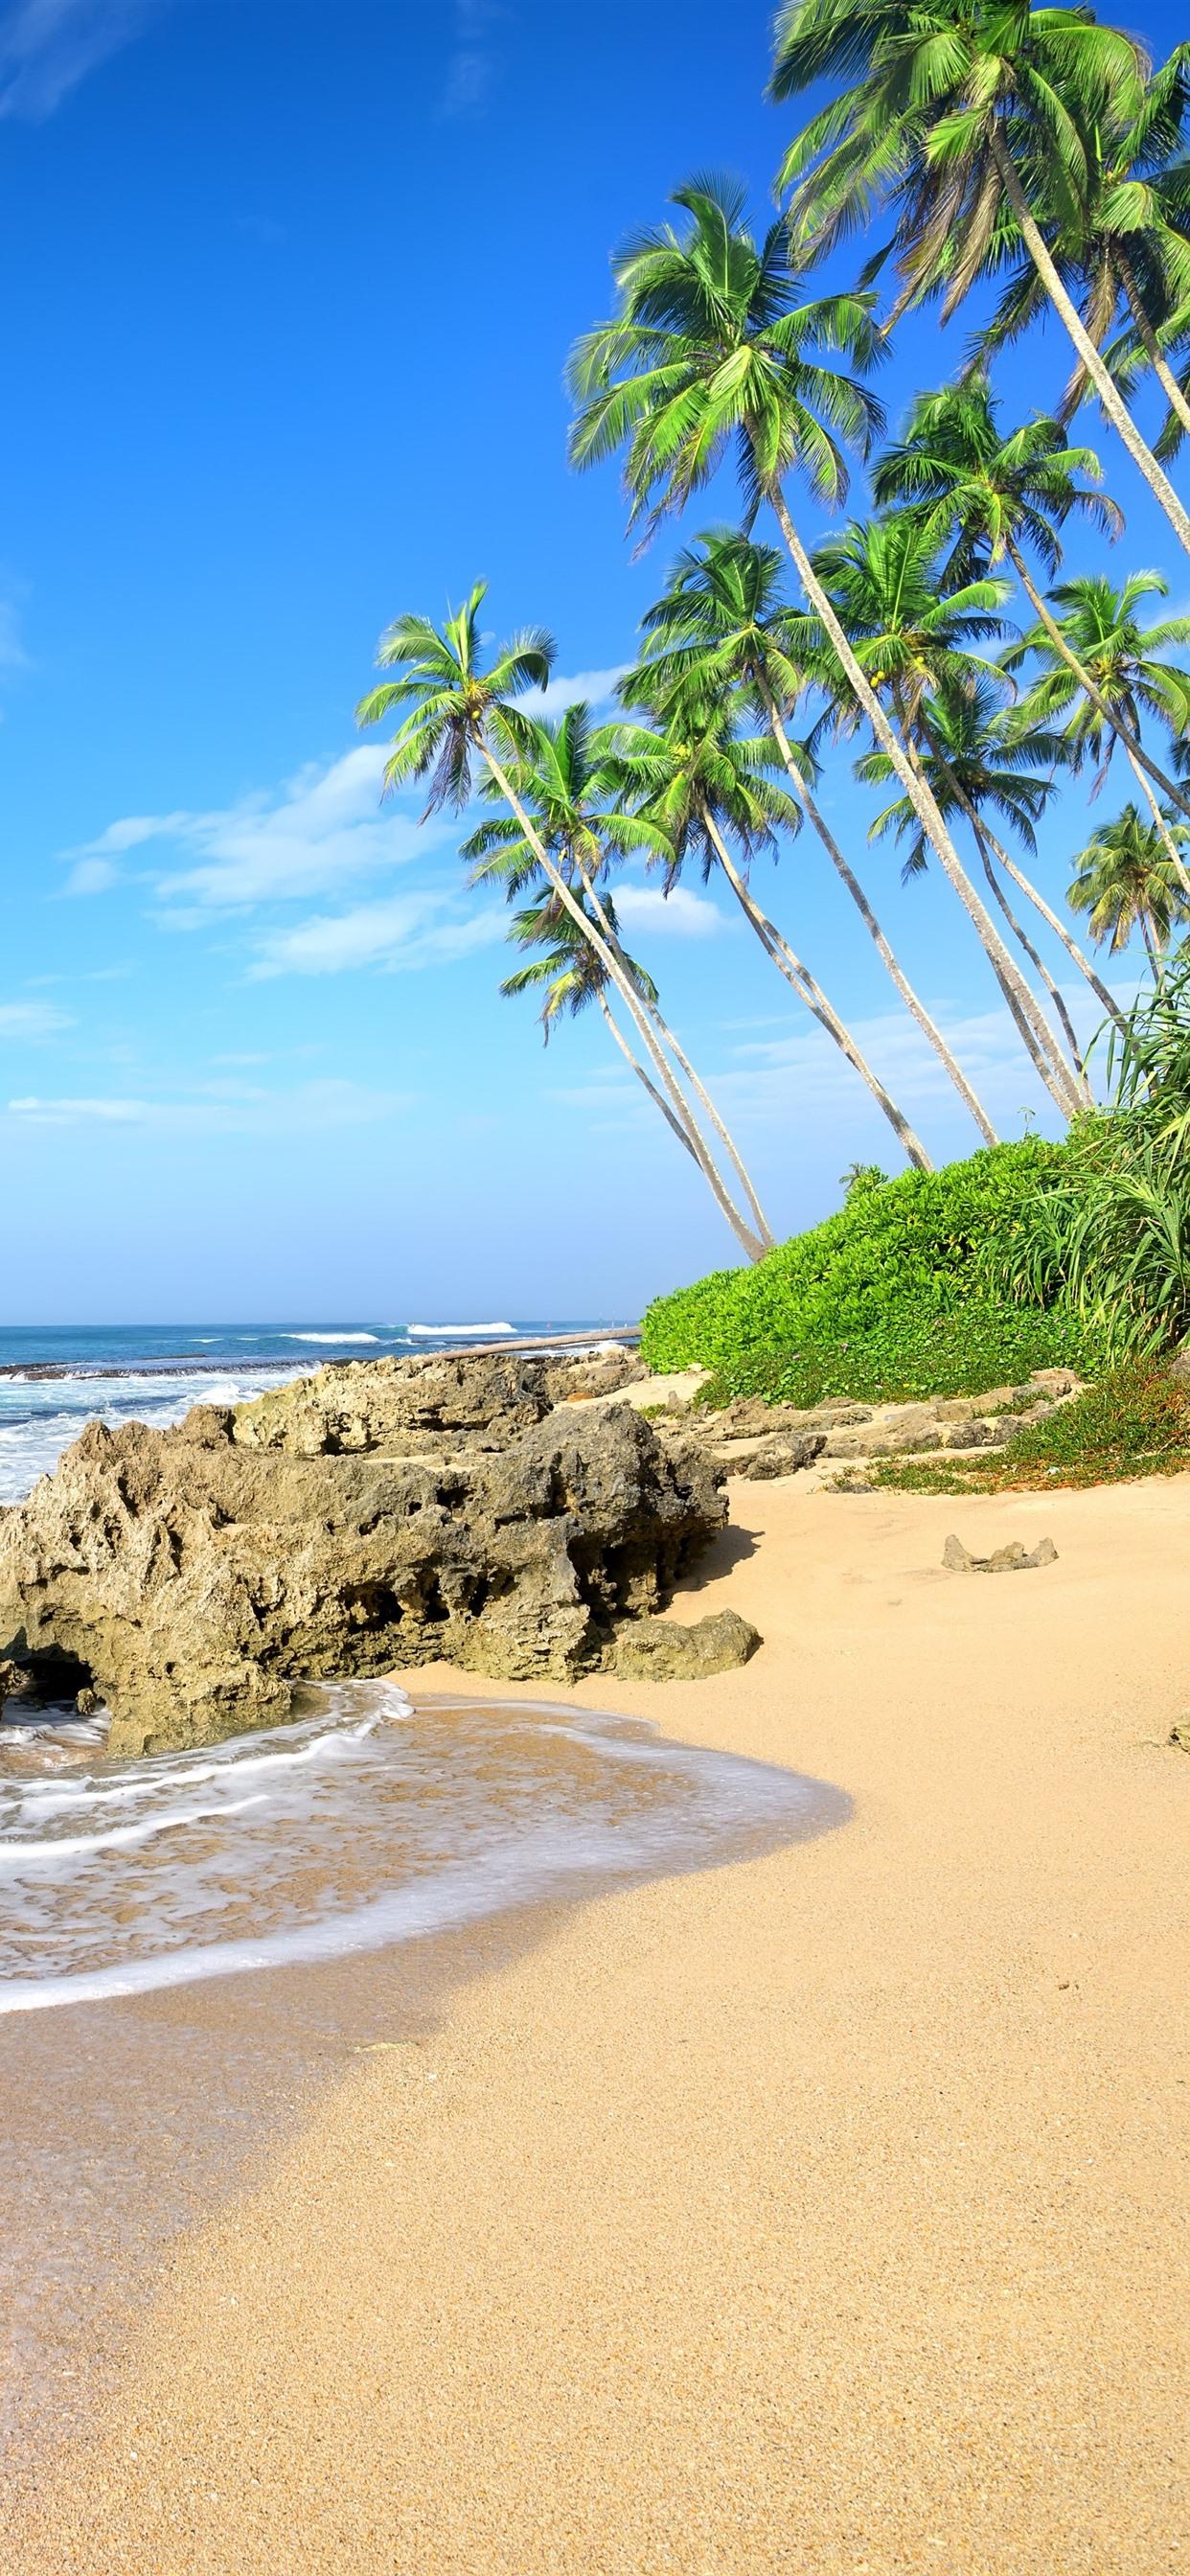 Palm Trees Beach Sea Waves Rocks 1242x2688 Iphone Xs Max